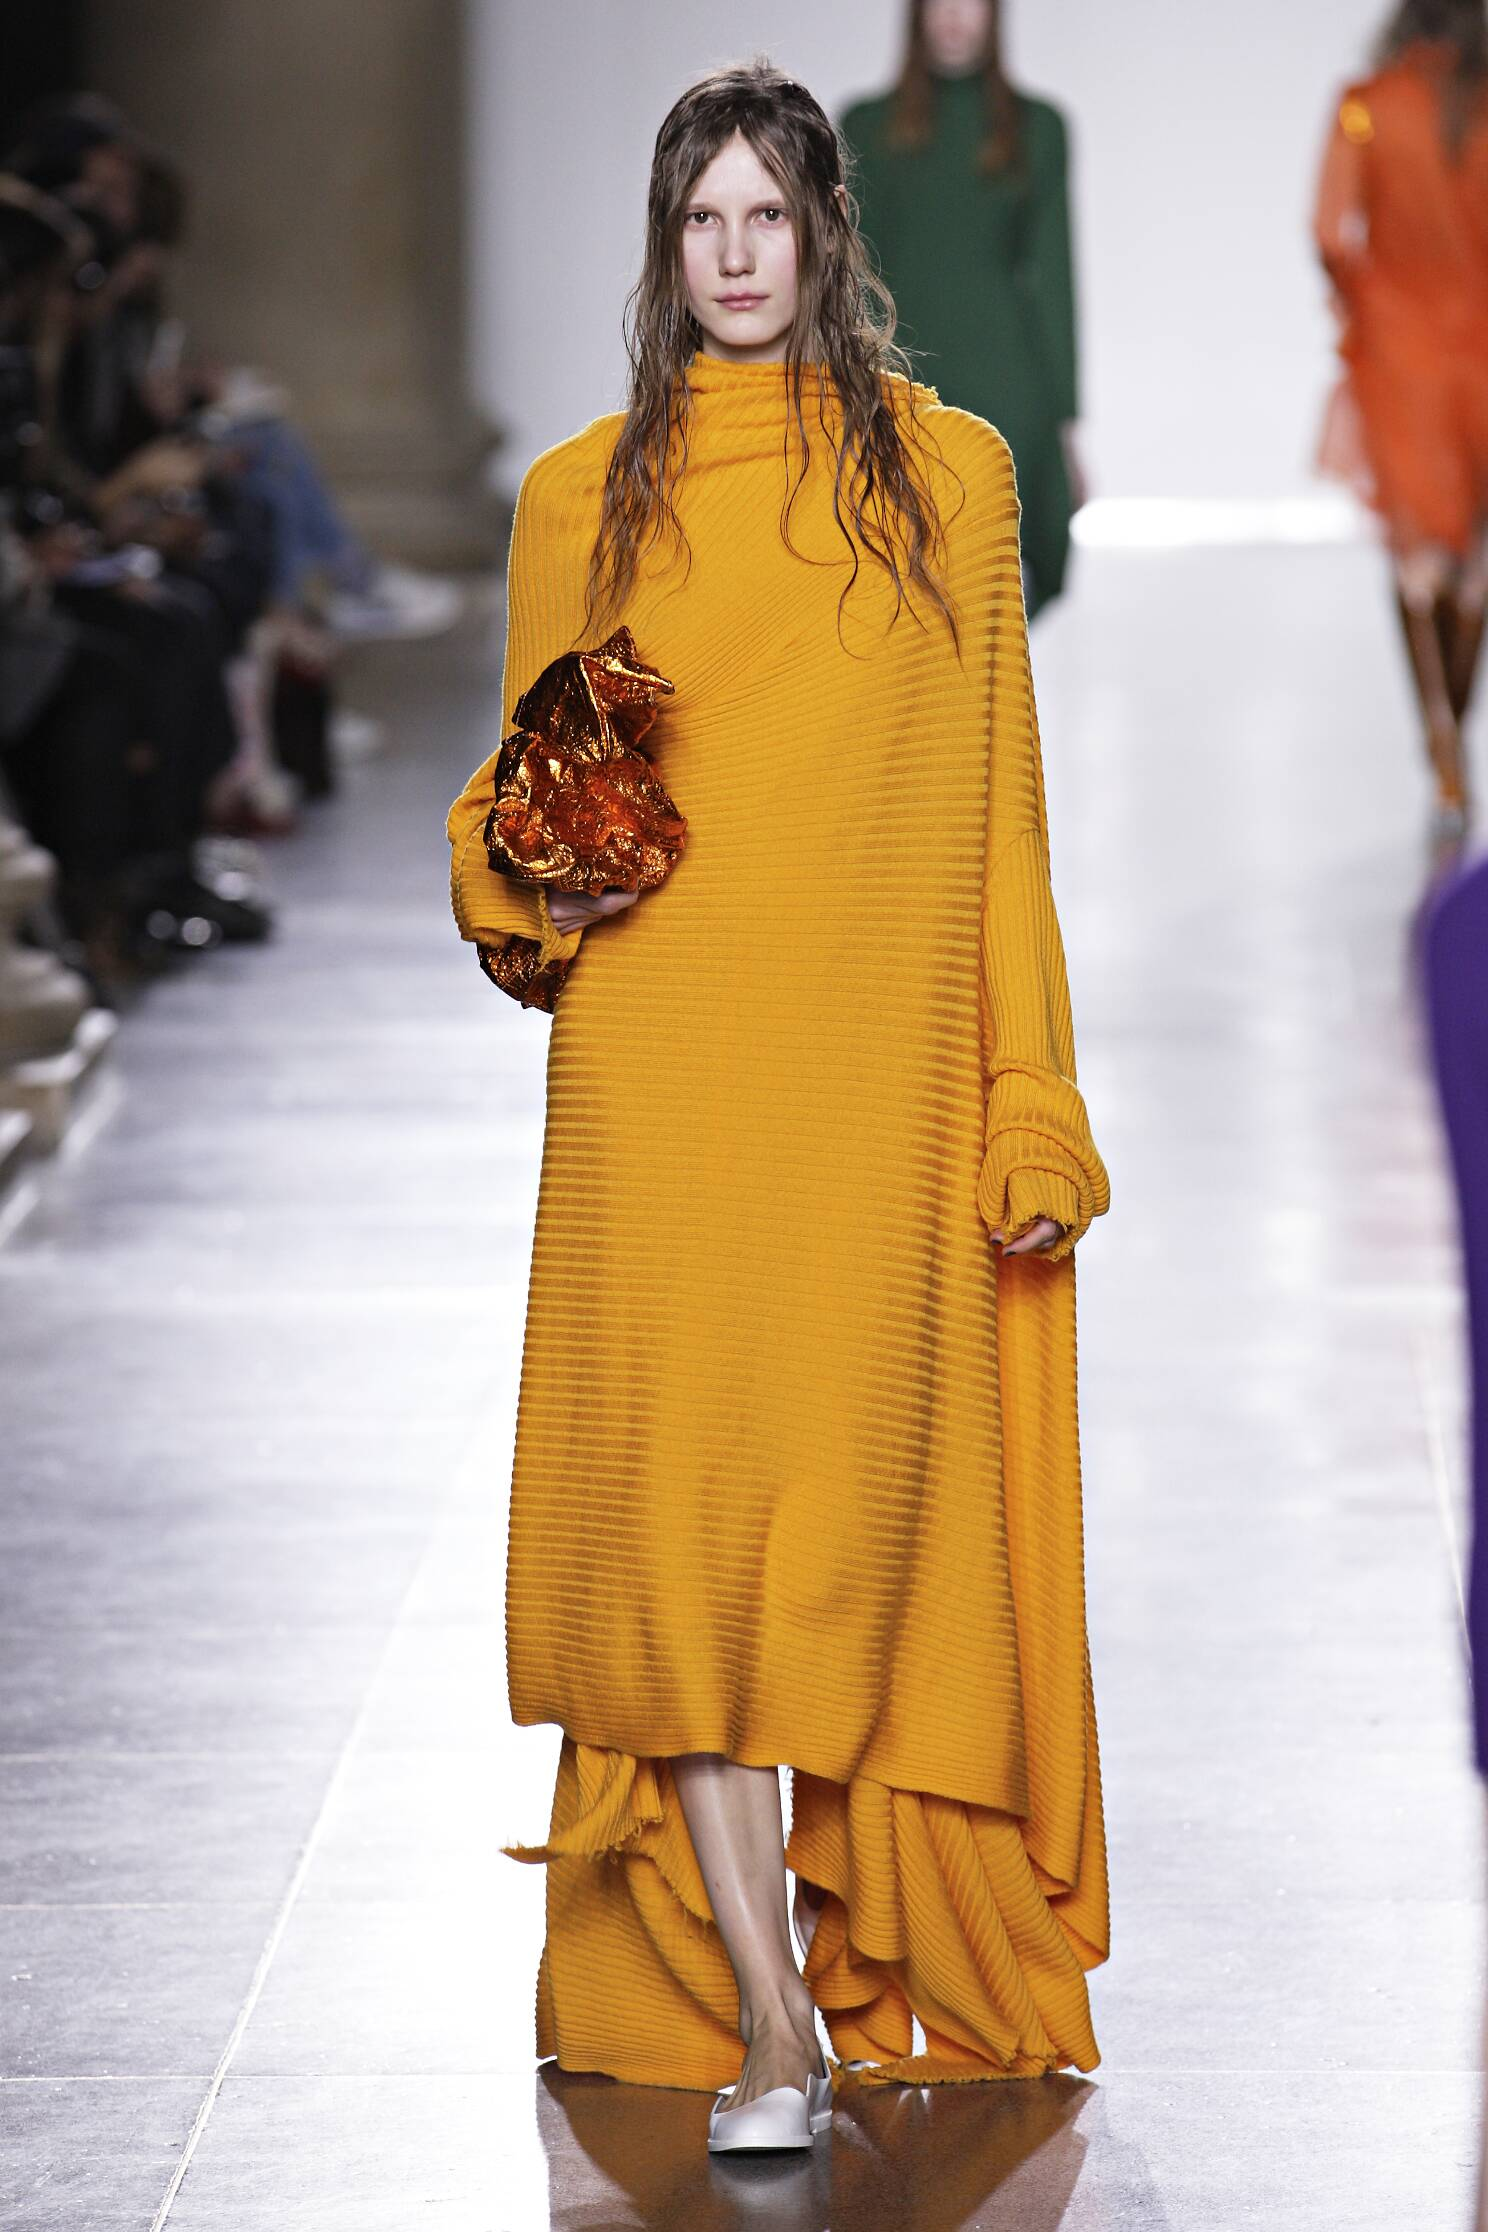 Marques Almeida Fall Winter 2015 16 Womens Collection London Fashion Week